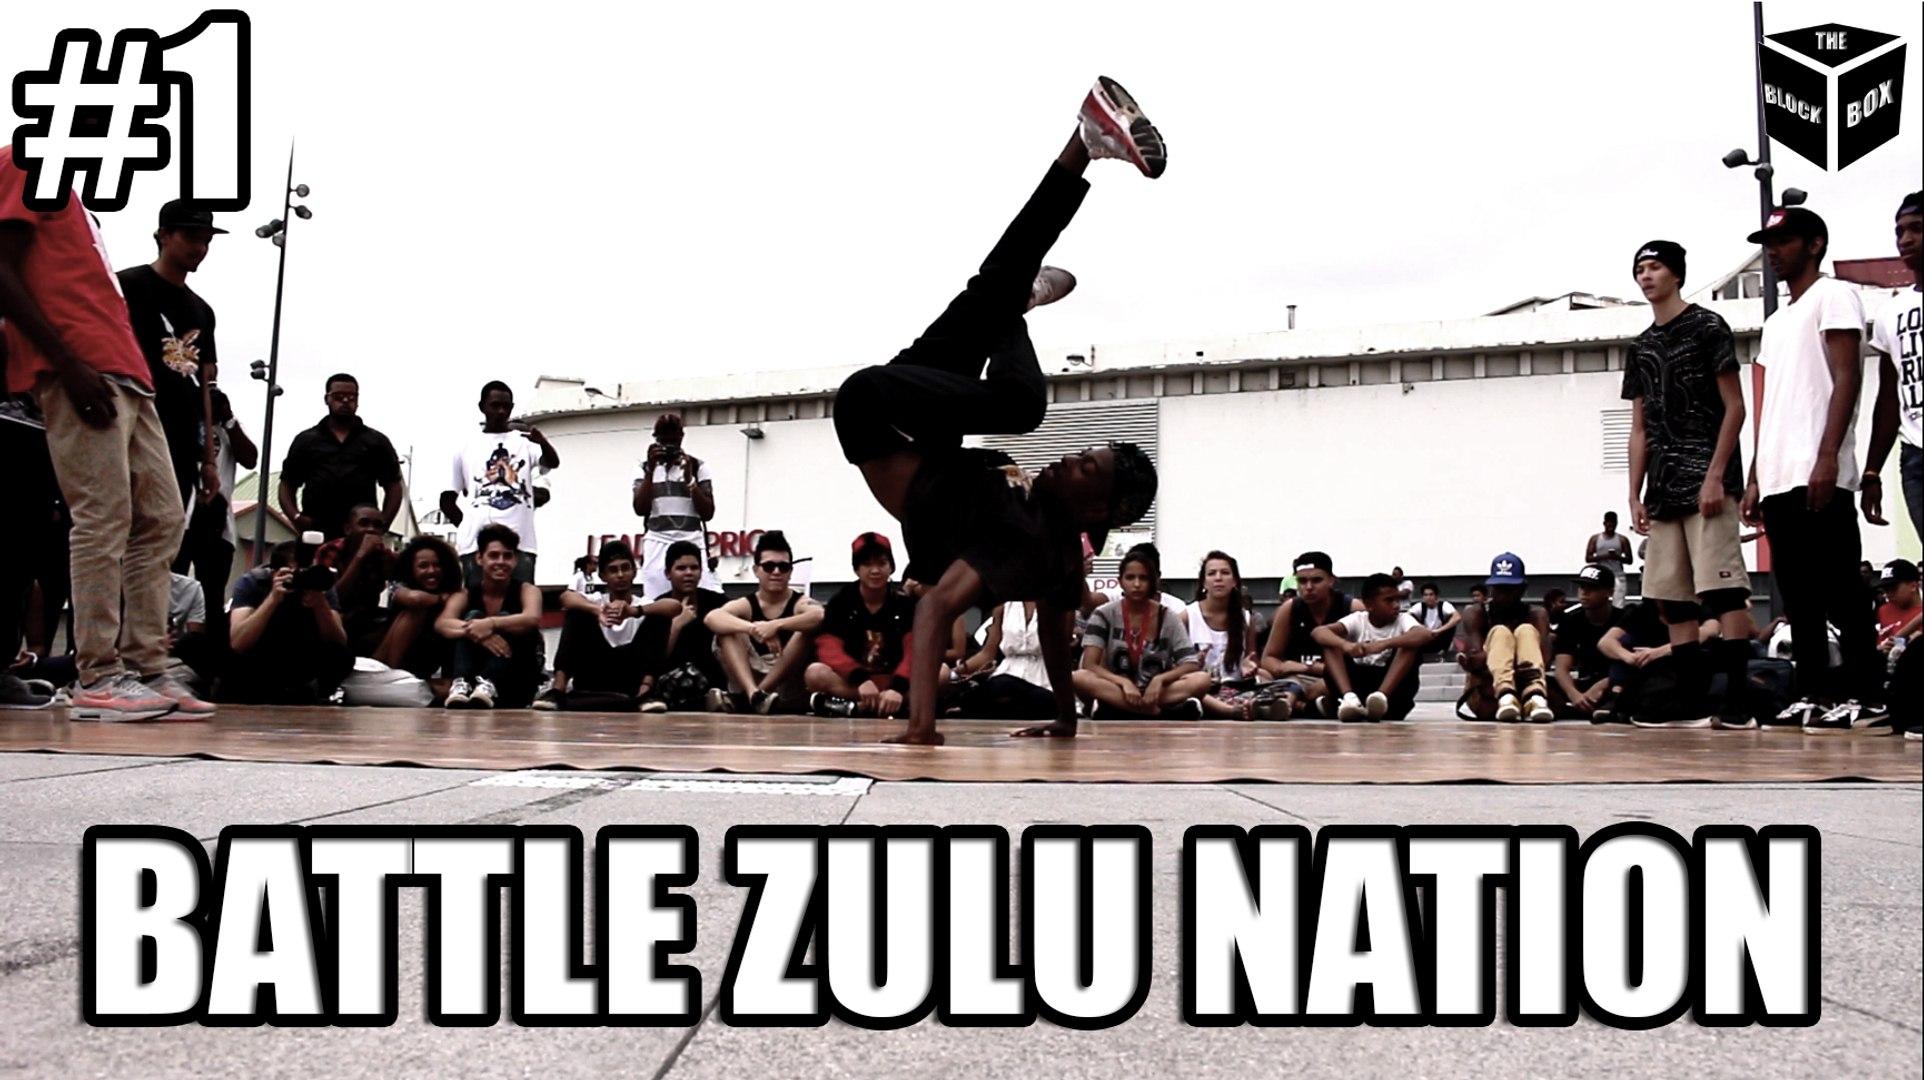 BATTLE BREAKDANCE ZULU NATION : Skandal Zulu Kidz vs Brigands Crew - Par BlockBox Studio